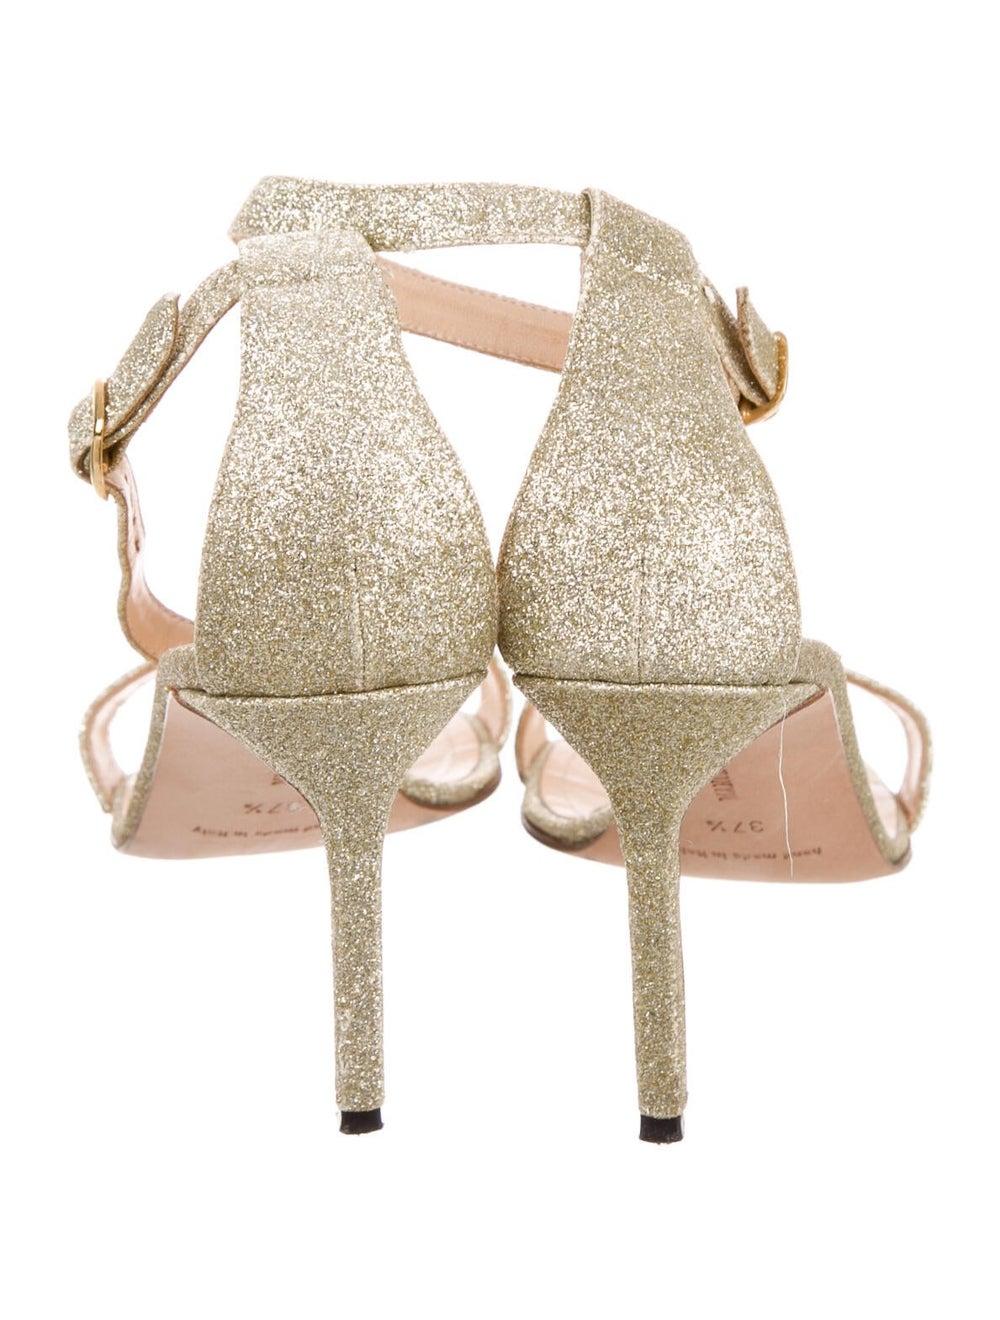 Manolo Blahnik Sandals Gold - image 4